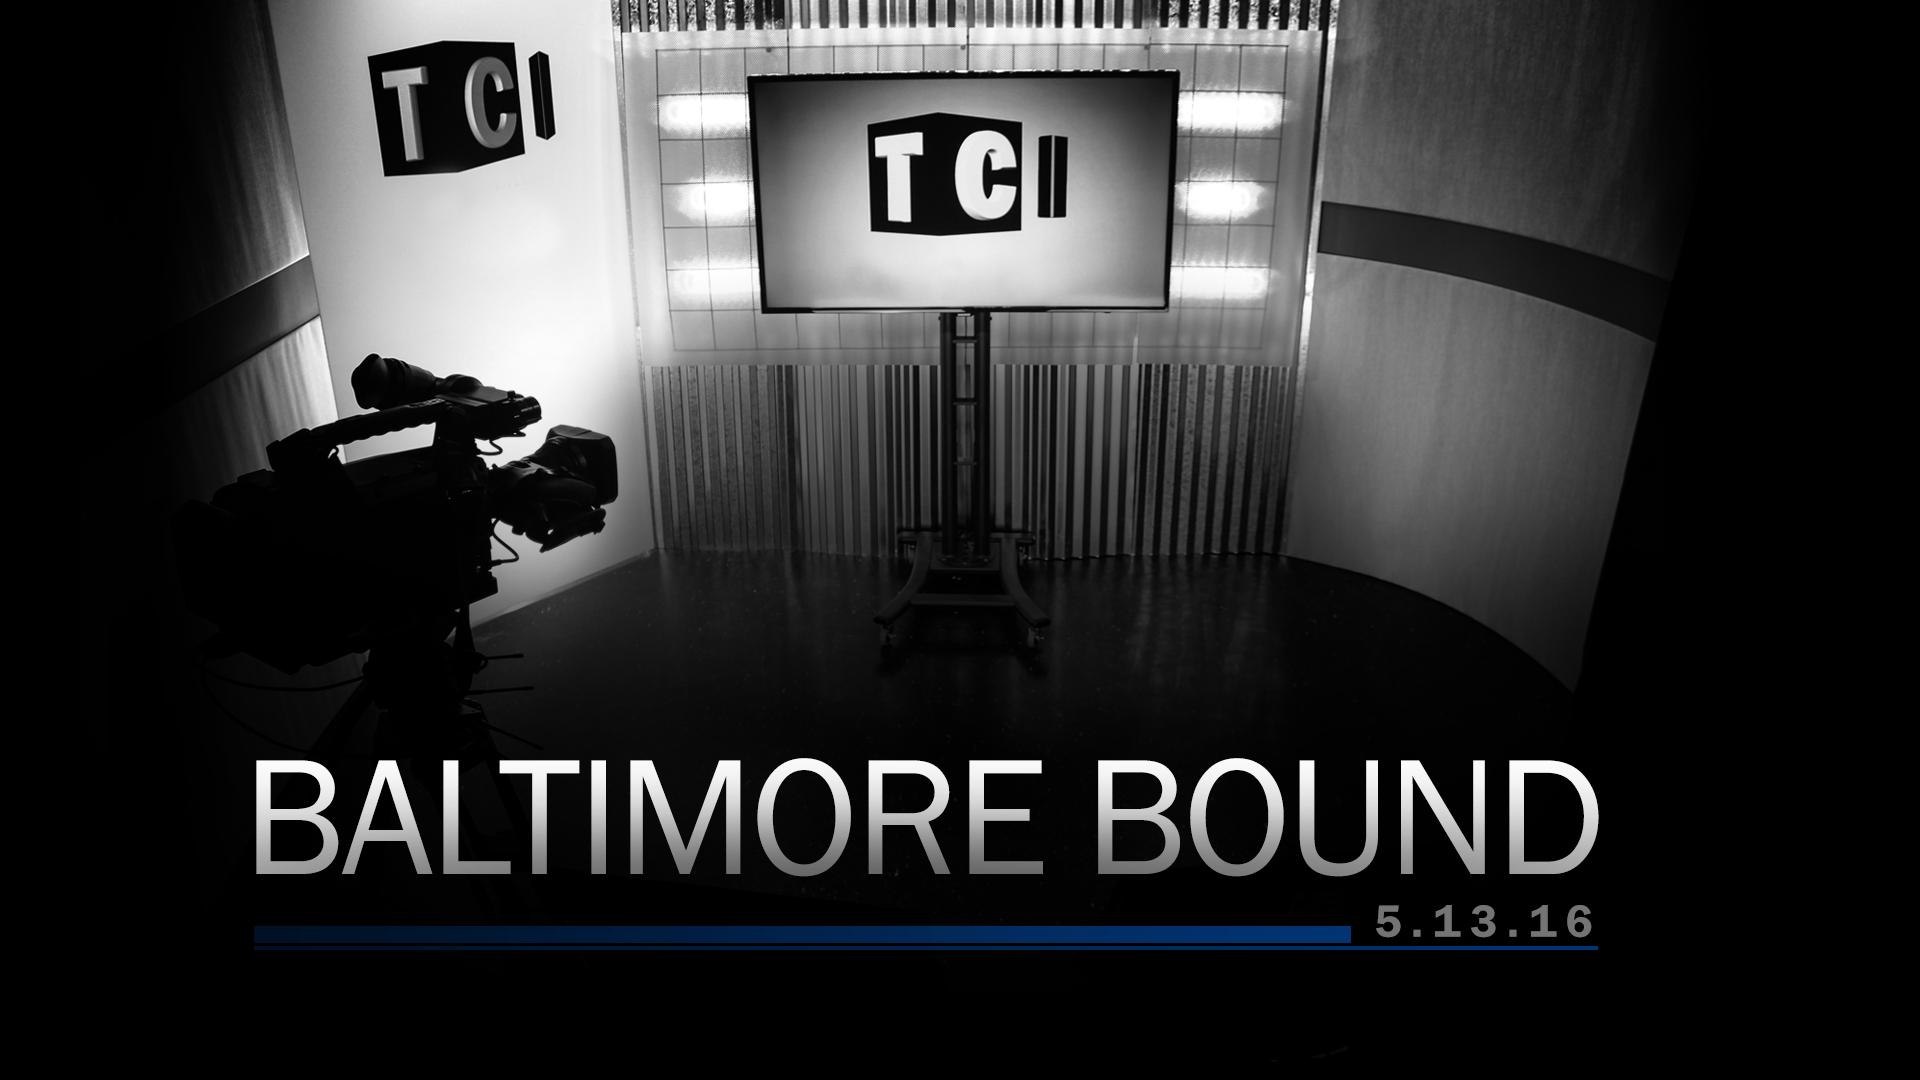 TCI: Kentucky Derby recap, Preakness first look – 05/13/2016